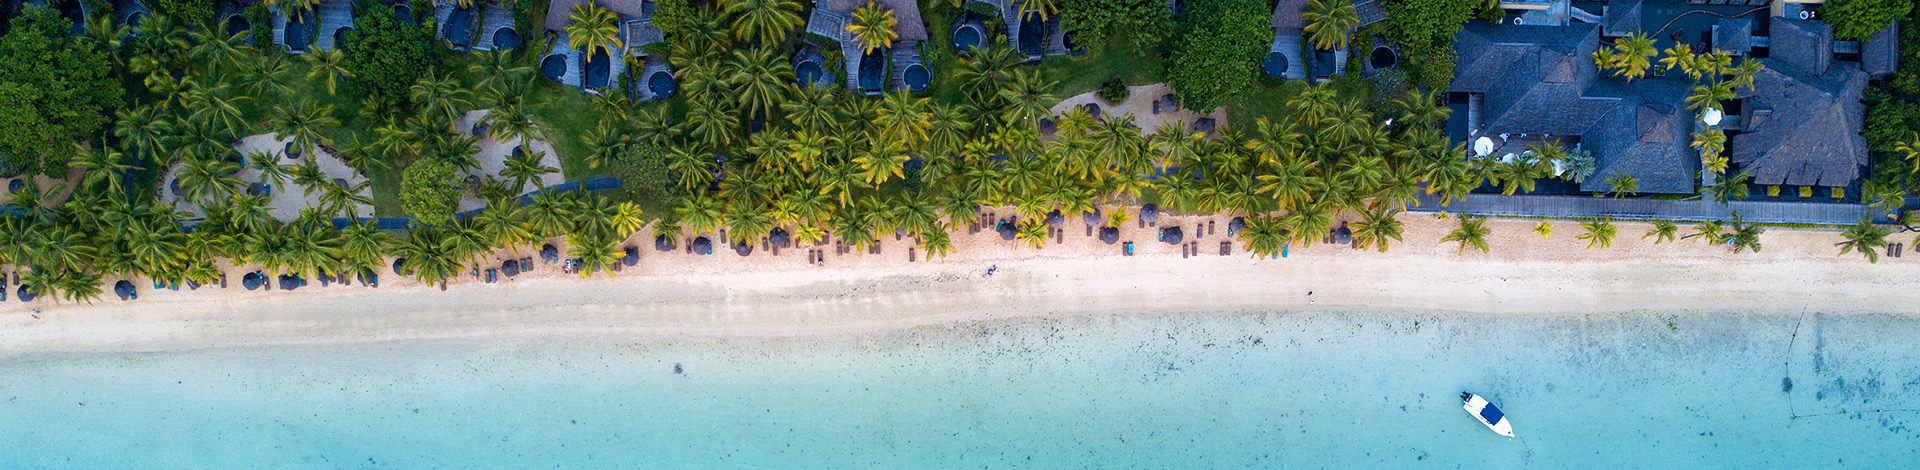 mauritius beachcomber resorts and hotels covid 19